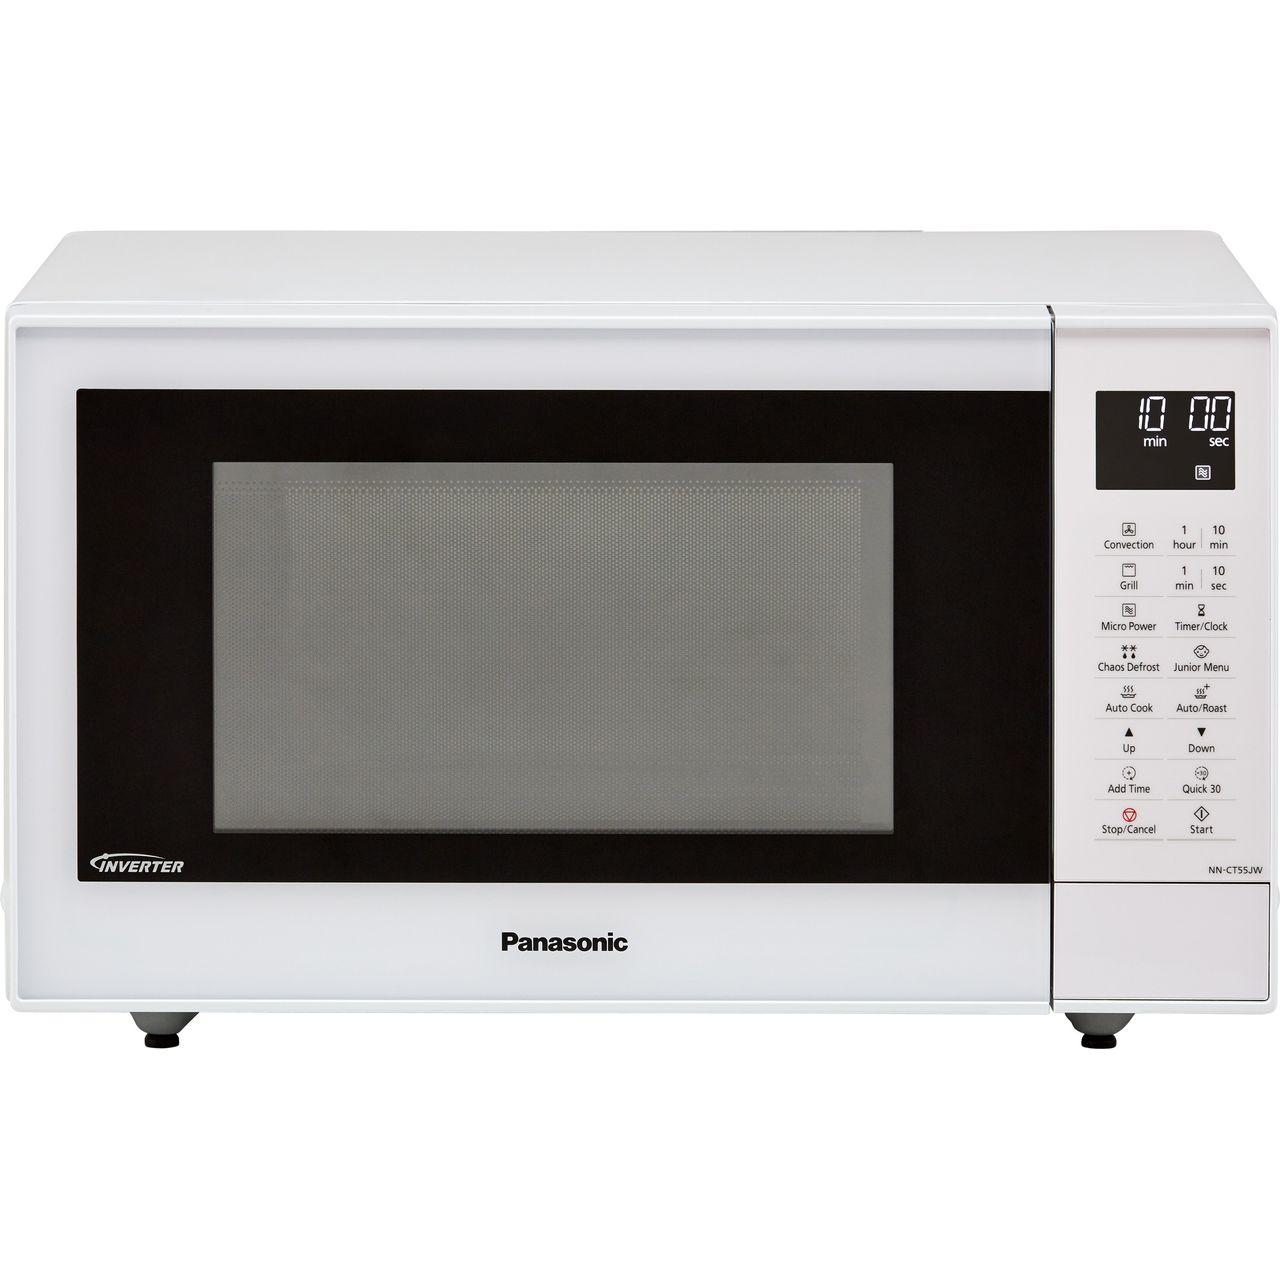 Panasonic Nn Ct55jwbpq 27 Litre Combination Microwave Oven White Wh